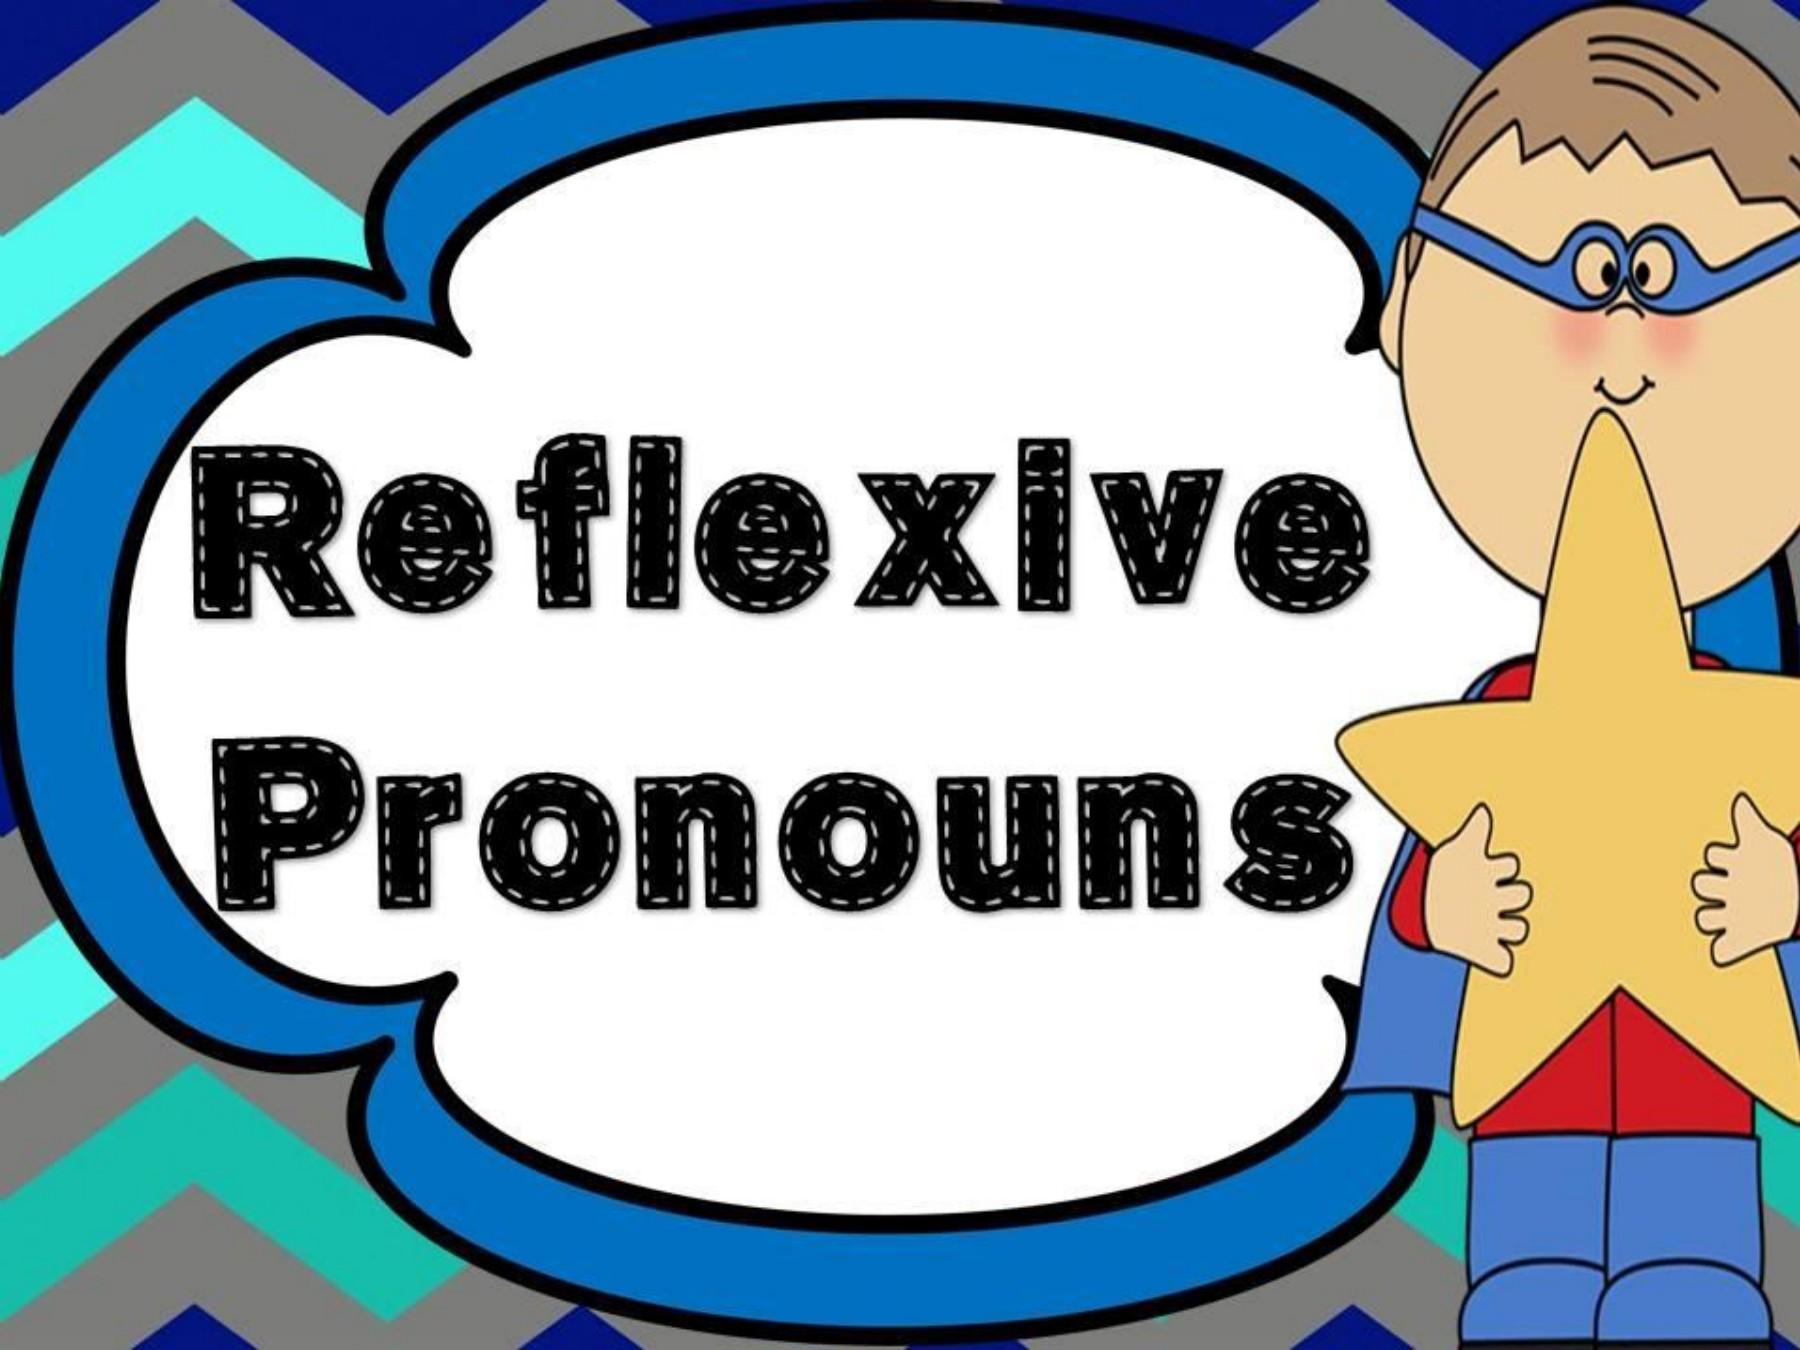 Reflexive pronoun clipart clipart black and white REFLEXIVE PRONOUNS clipart black and white